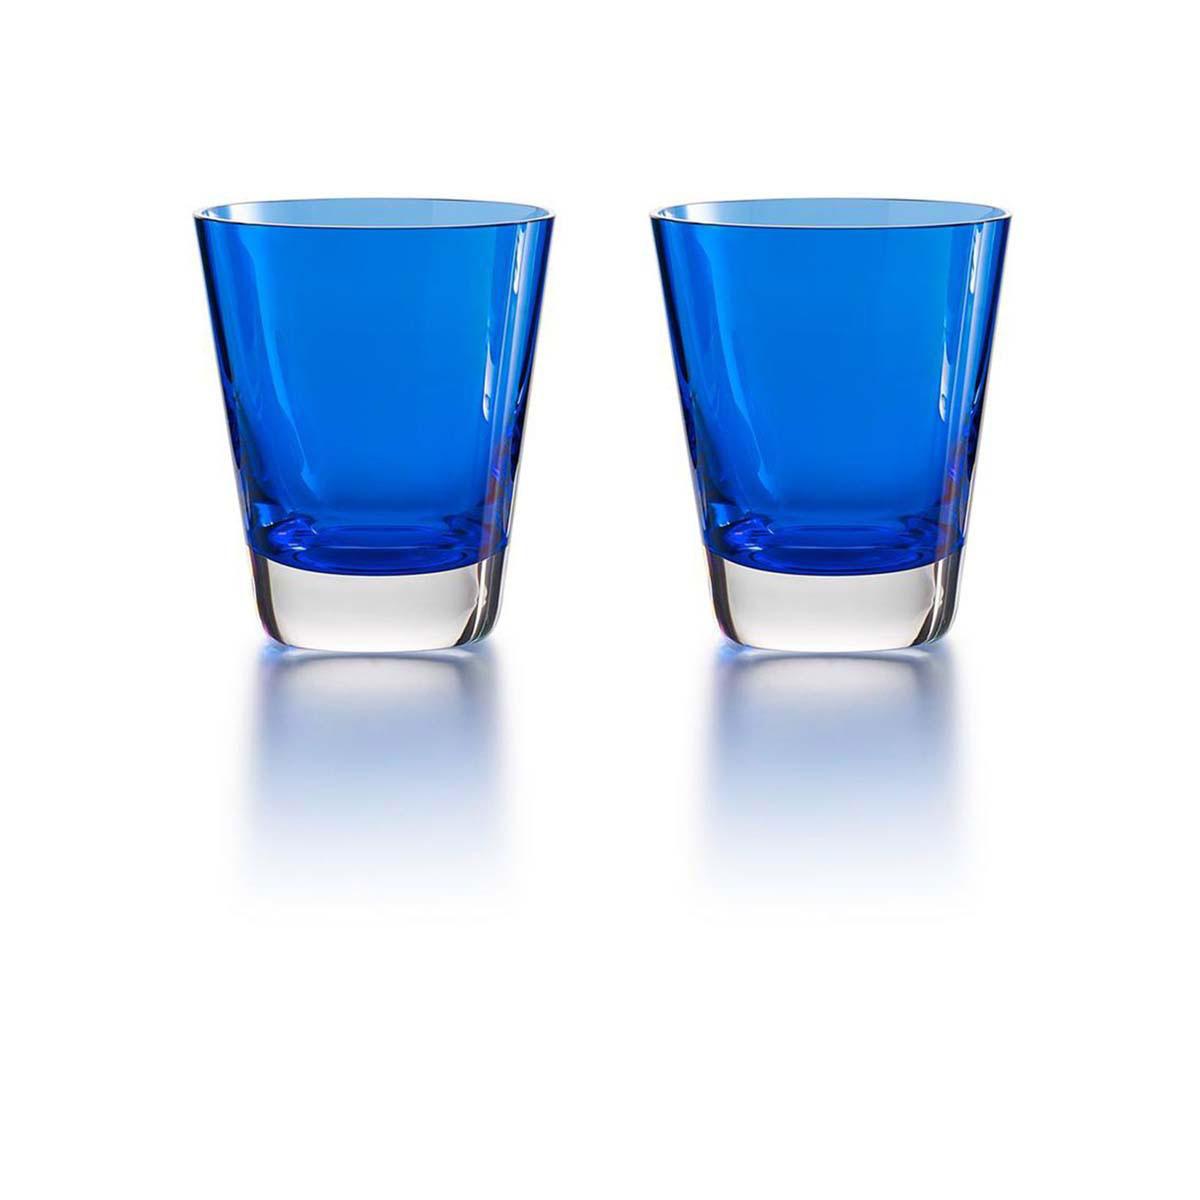 Baccarat Crystal, Mosaique Blue Tumbler, Pair